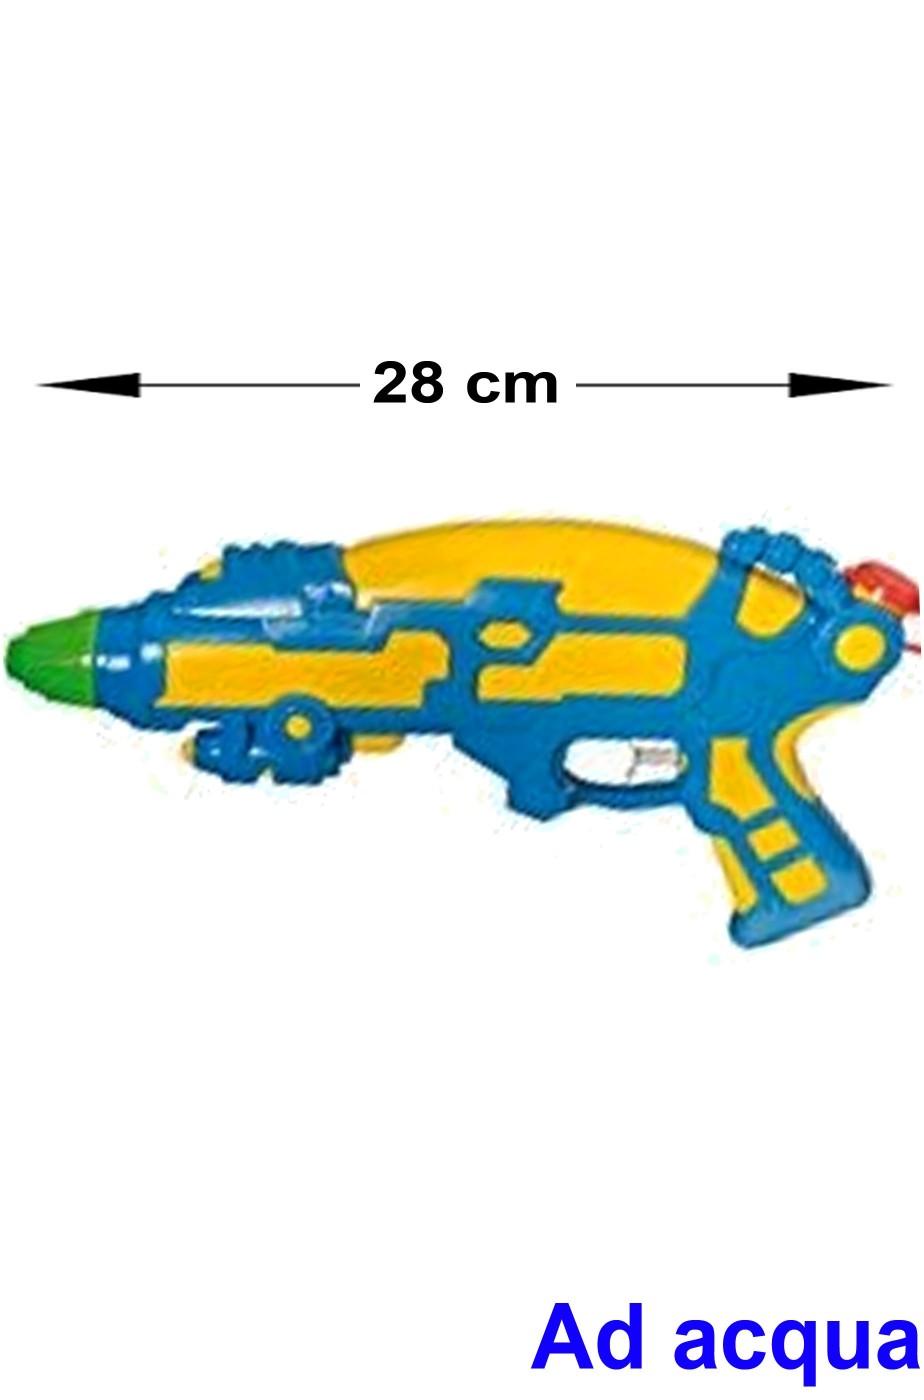 Pistola ad acqua spaziale 28cm verde